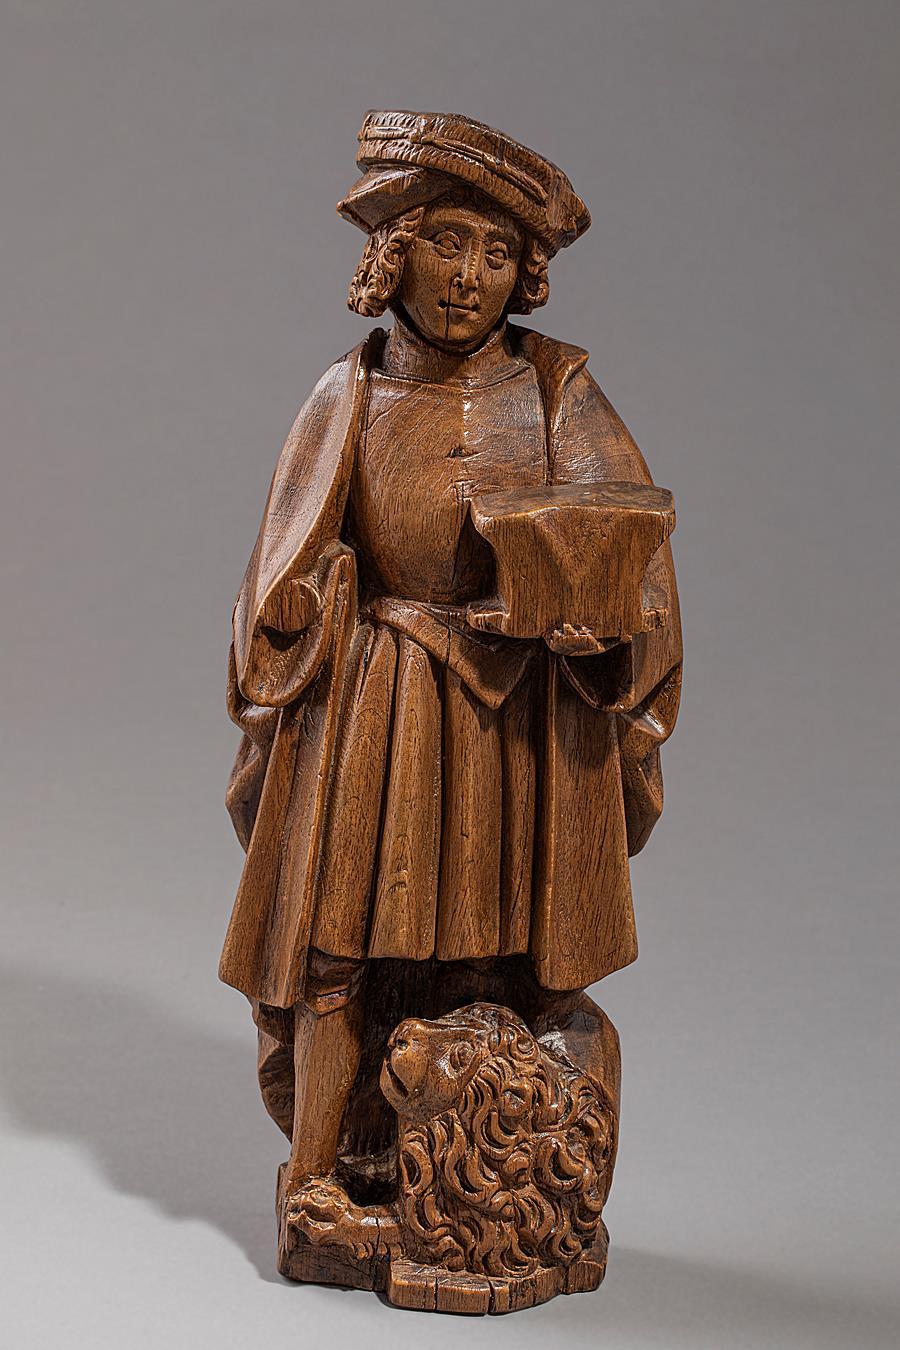 SAINT ADRIAN OF NICOMEDIA FLANDERS CIRCA 1500